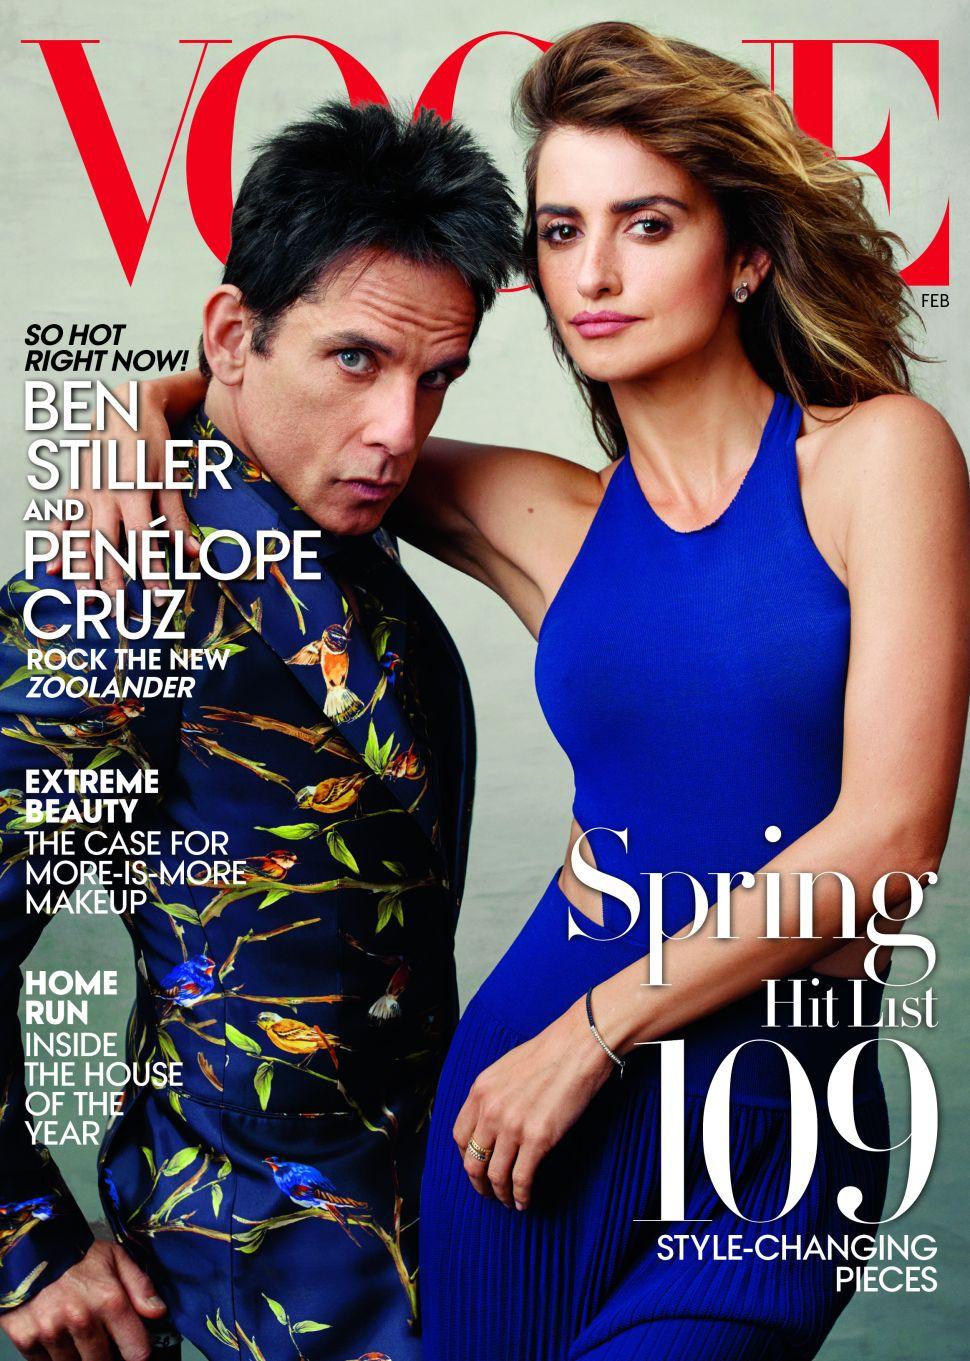 Derek Zoolander Finally Lands a 'Vogue' Cover